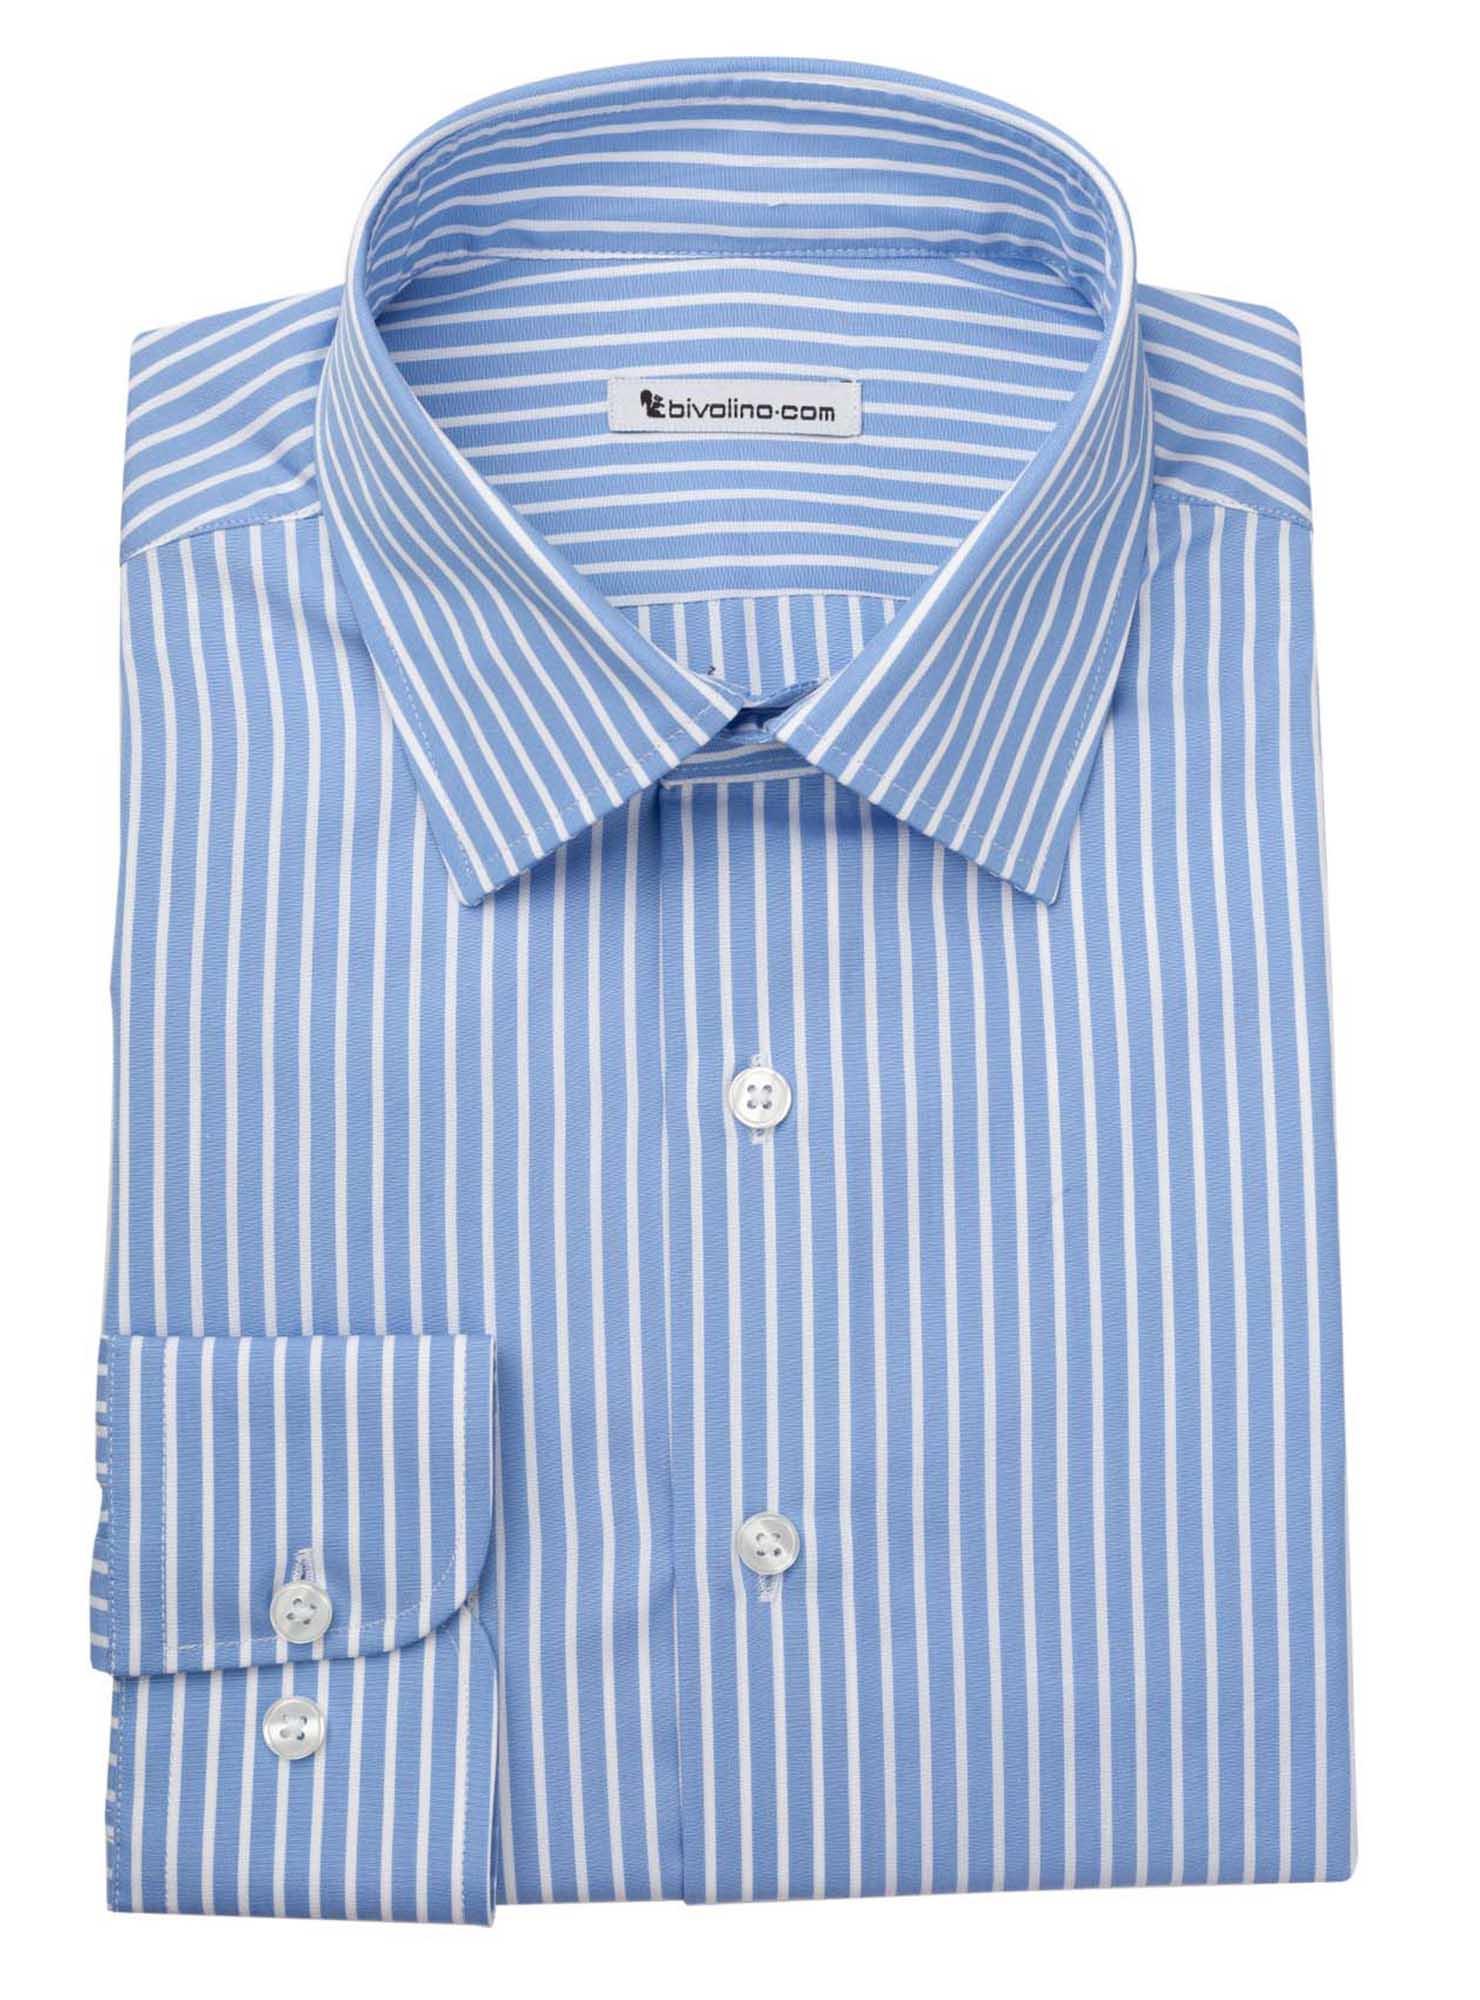 MARAGO  - Men's shrt cotton 2ply blue stripe - TUFO 0